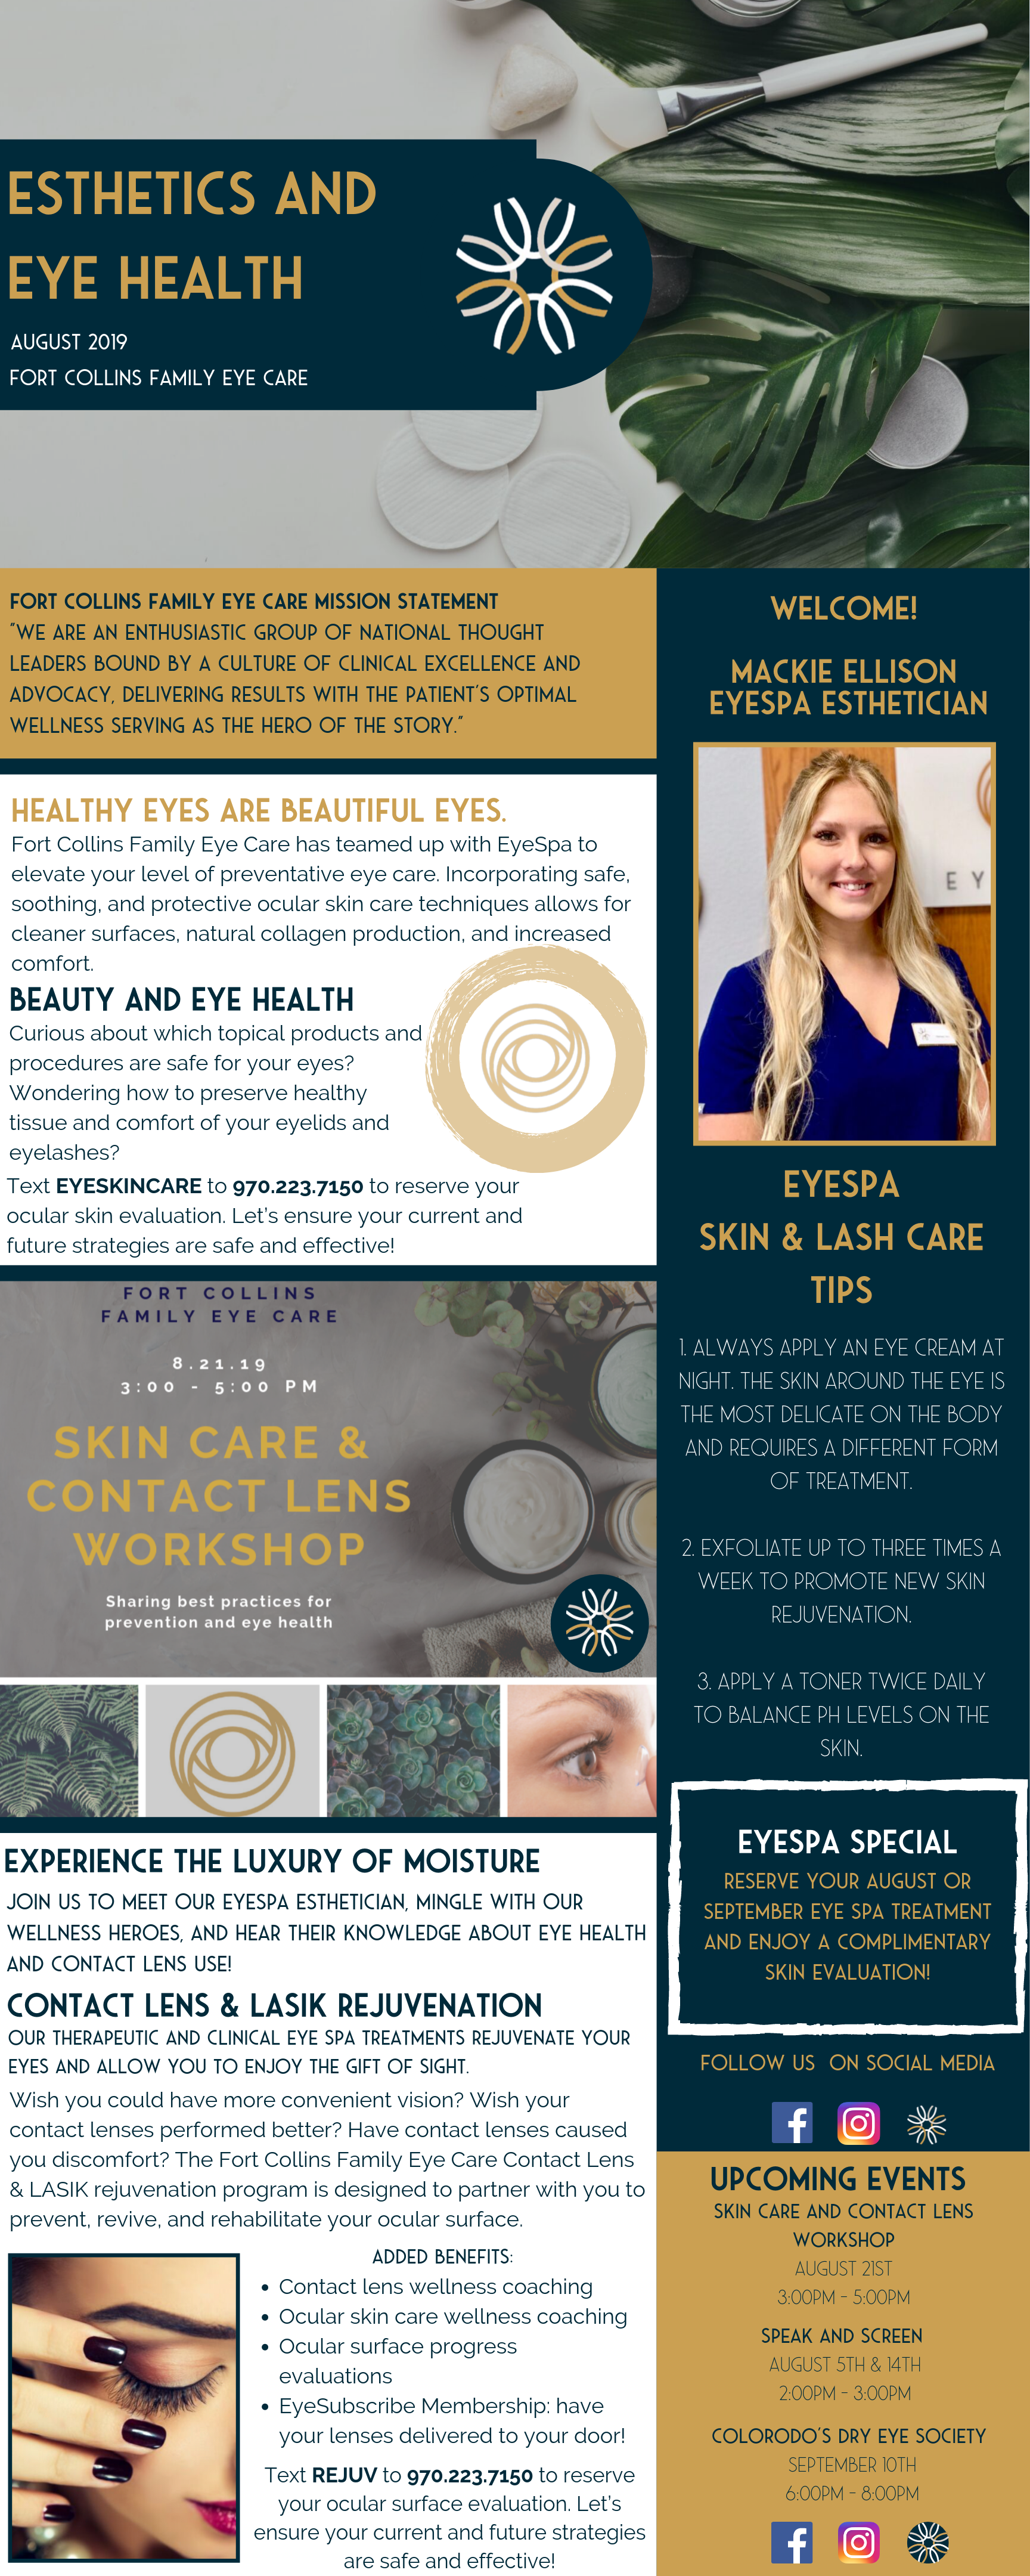 August Aesthetics & Eye Health-8.png